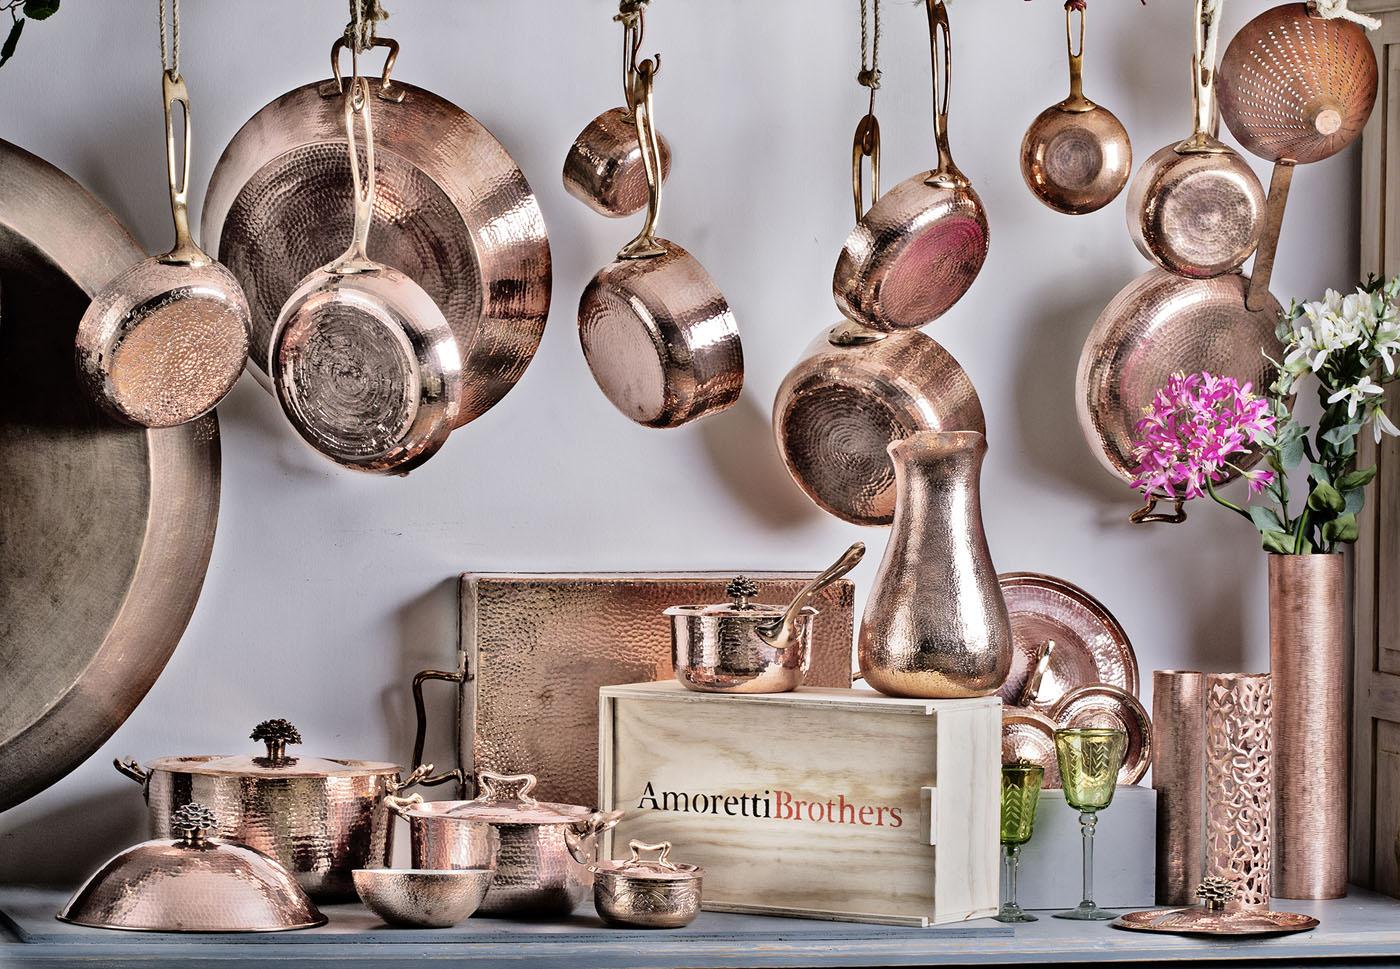 Amoretti Brothers Copper Cookware